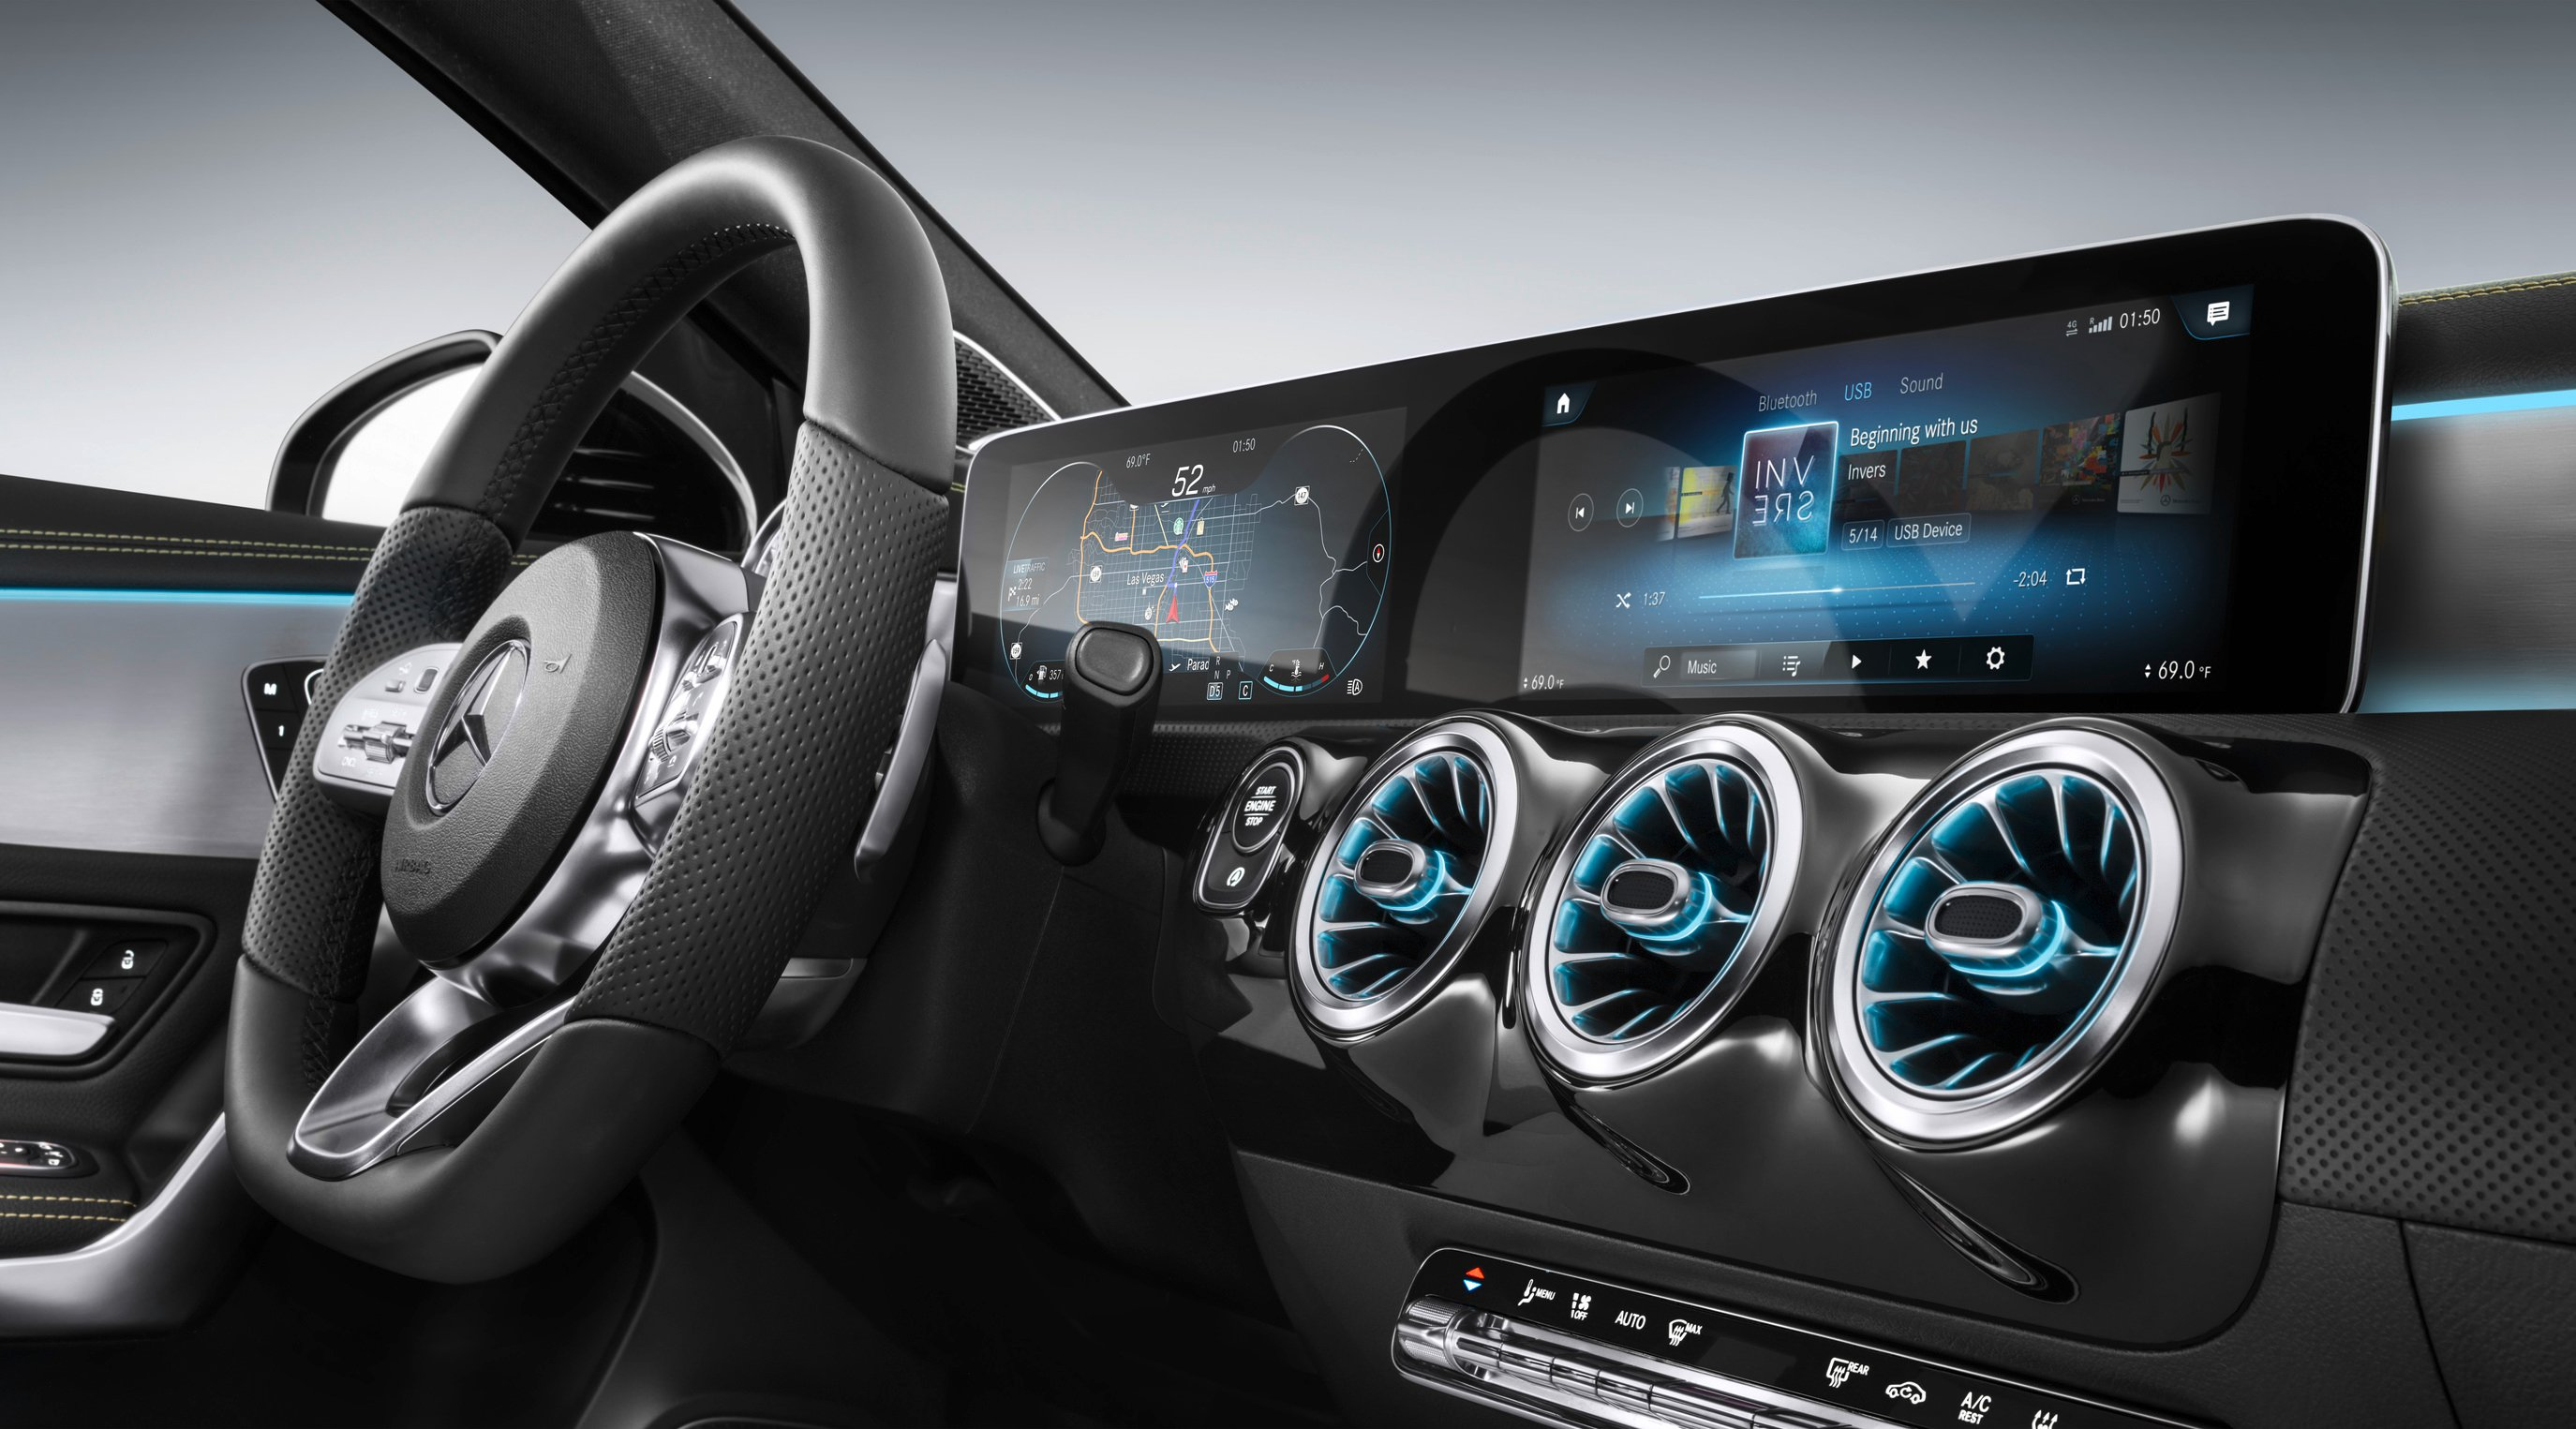 Mercedes-Benz A 200 AMG.